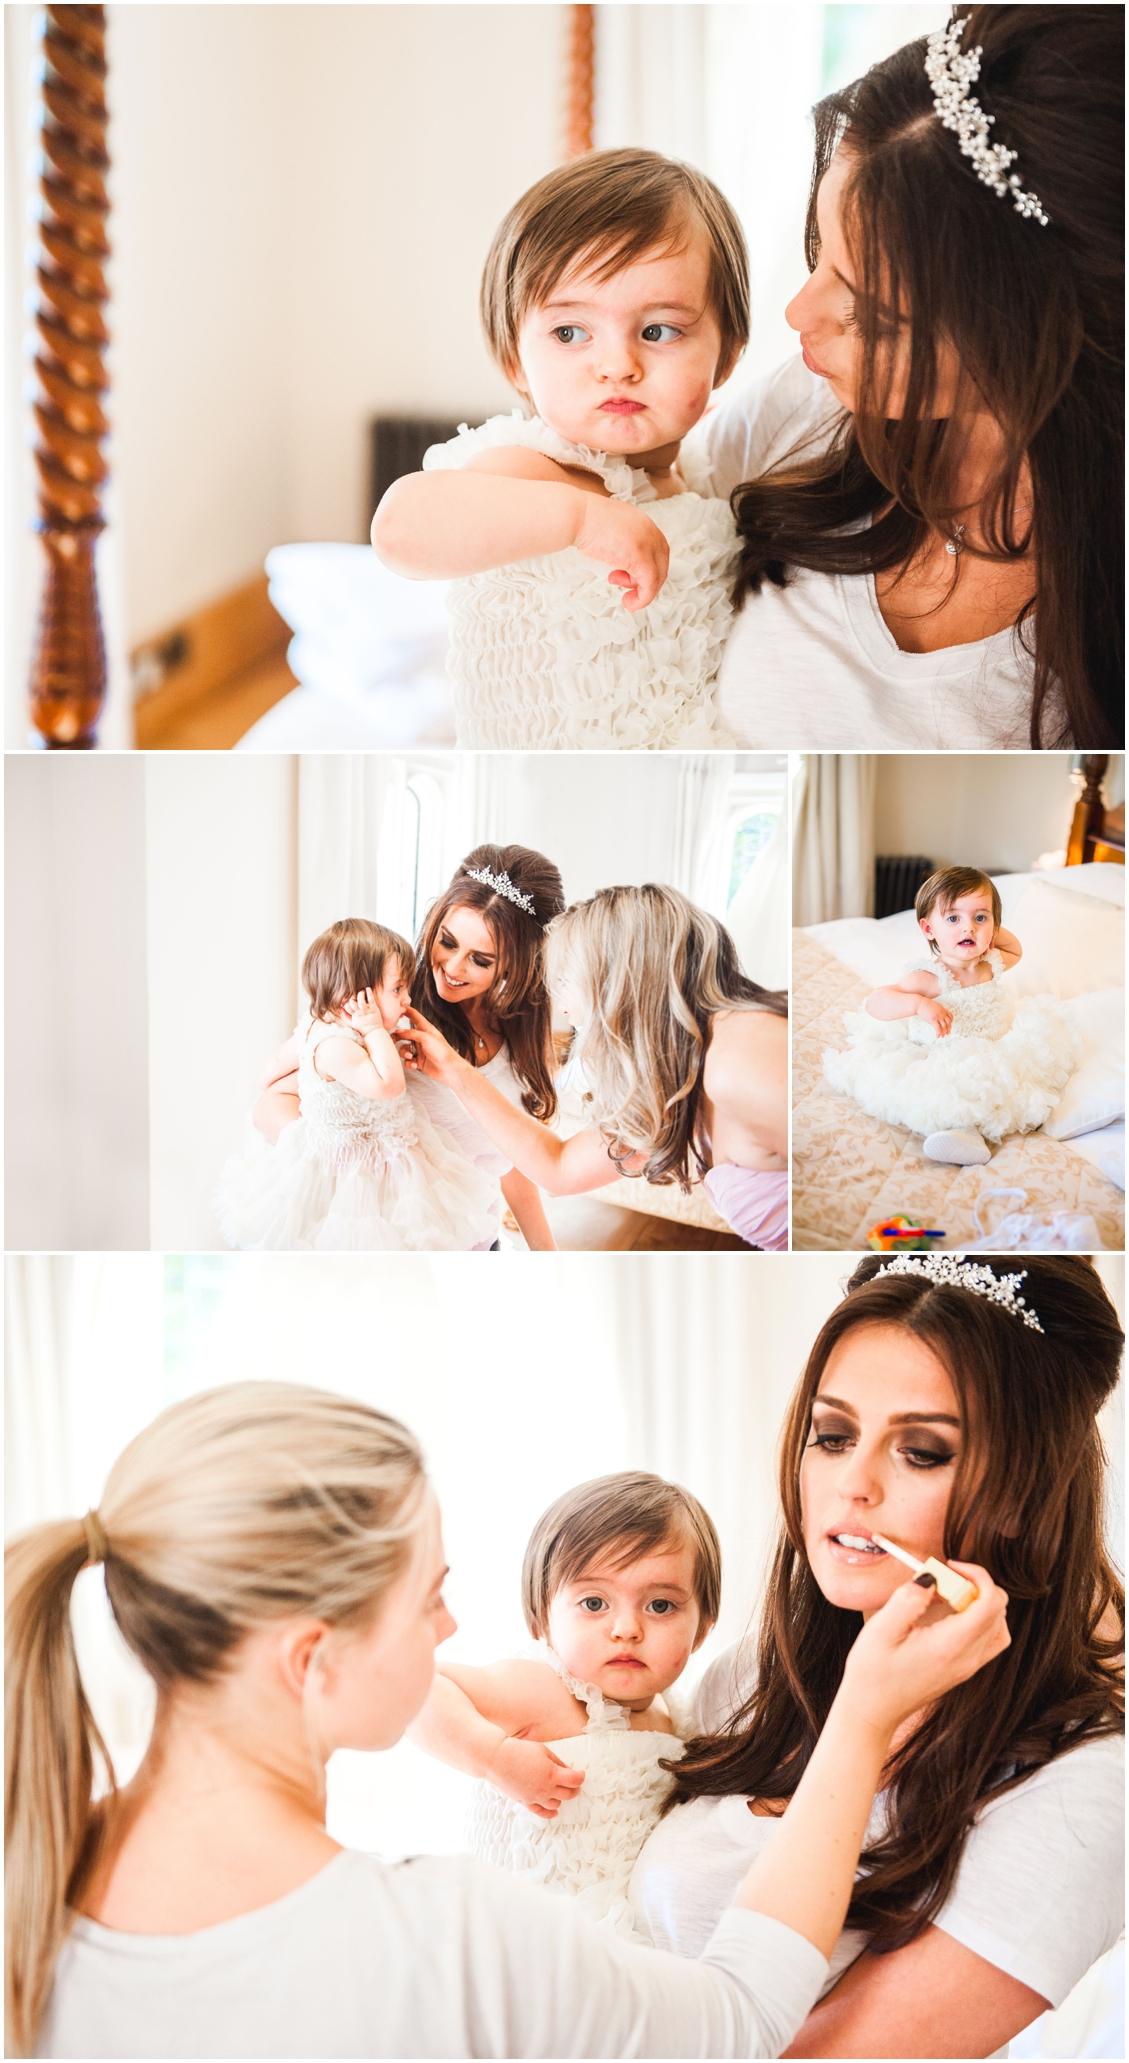 Notley Abbey, Wedding Photography, Lisa Carpenter Photography, photos, Oxfordshire, West Midlands